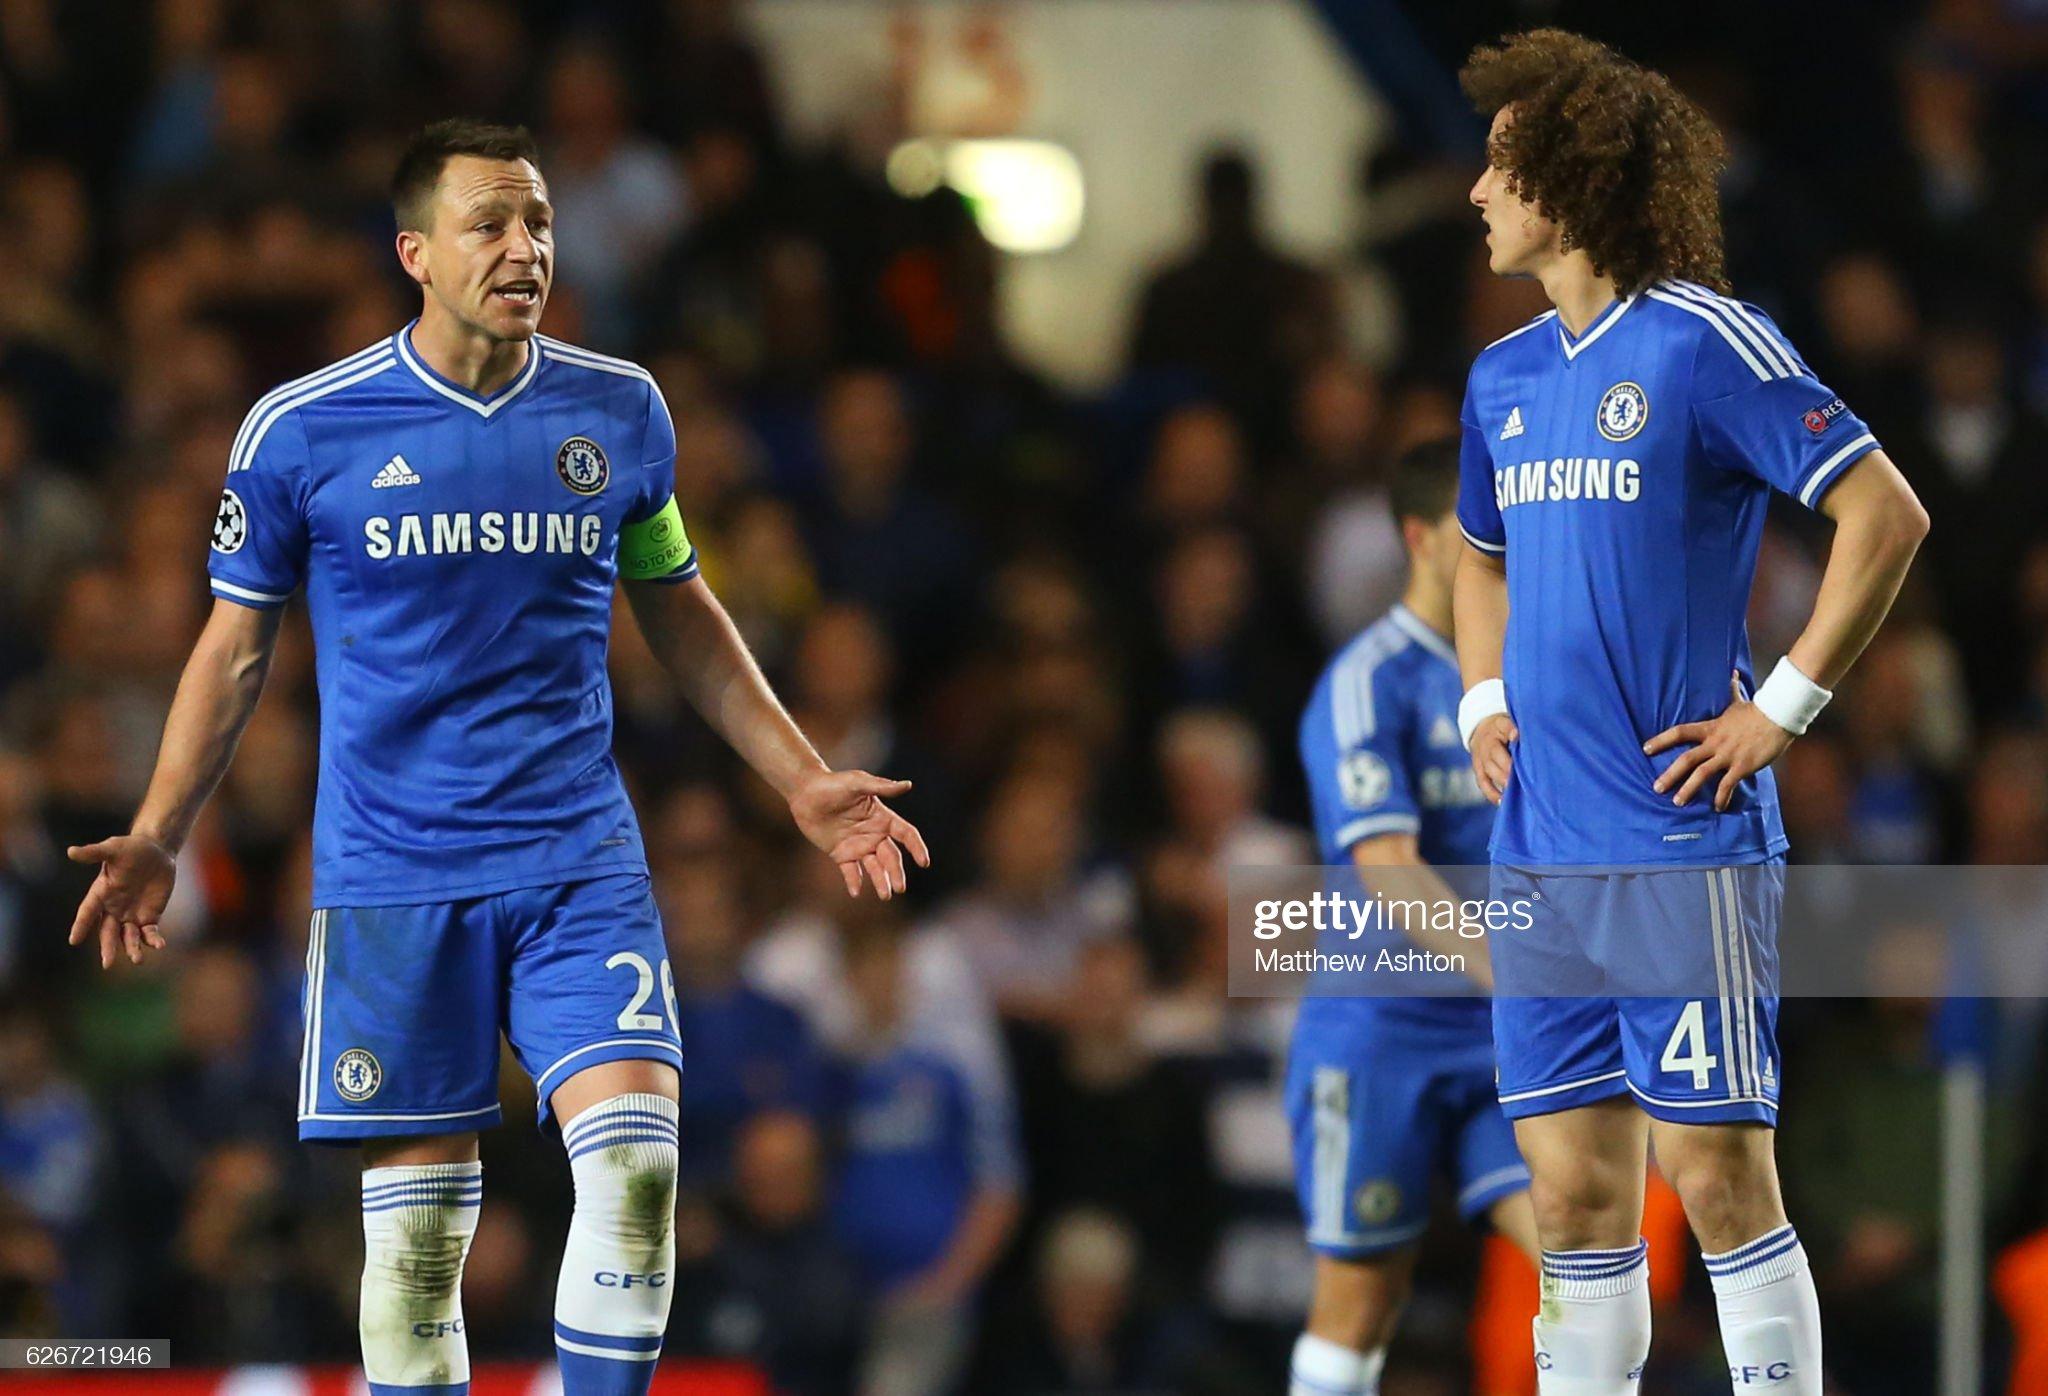 Soccer : UEFA Champions League semi-final 2nd Leg - Chelsea v Atletico Madrid : News Photo